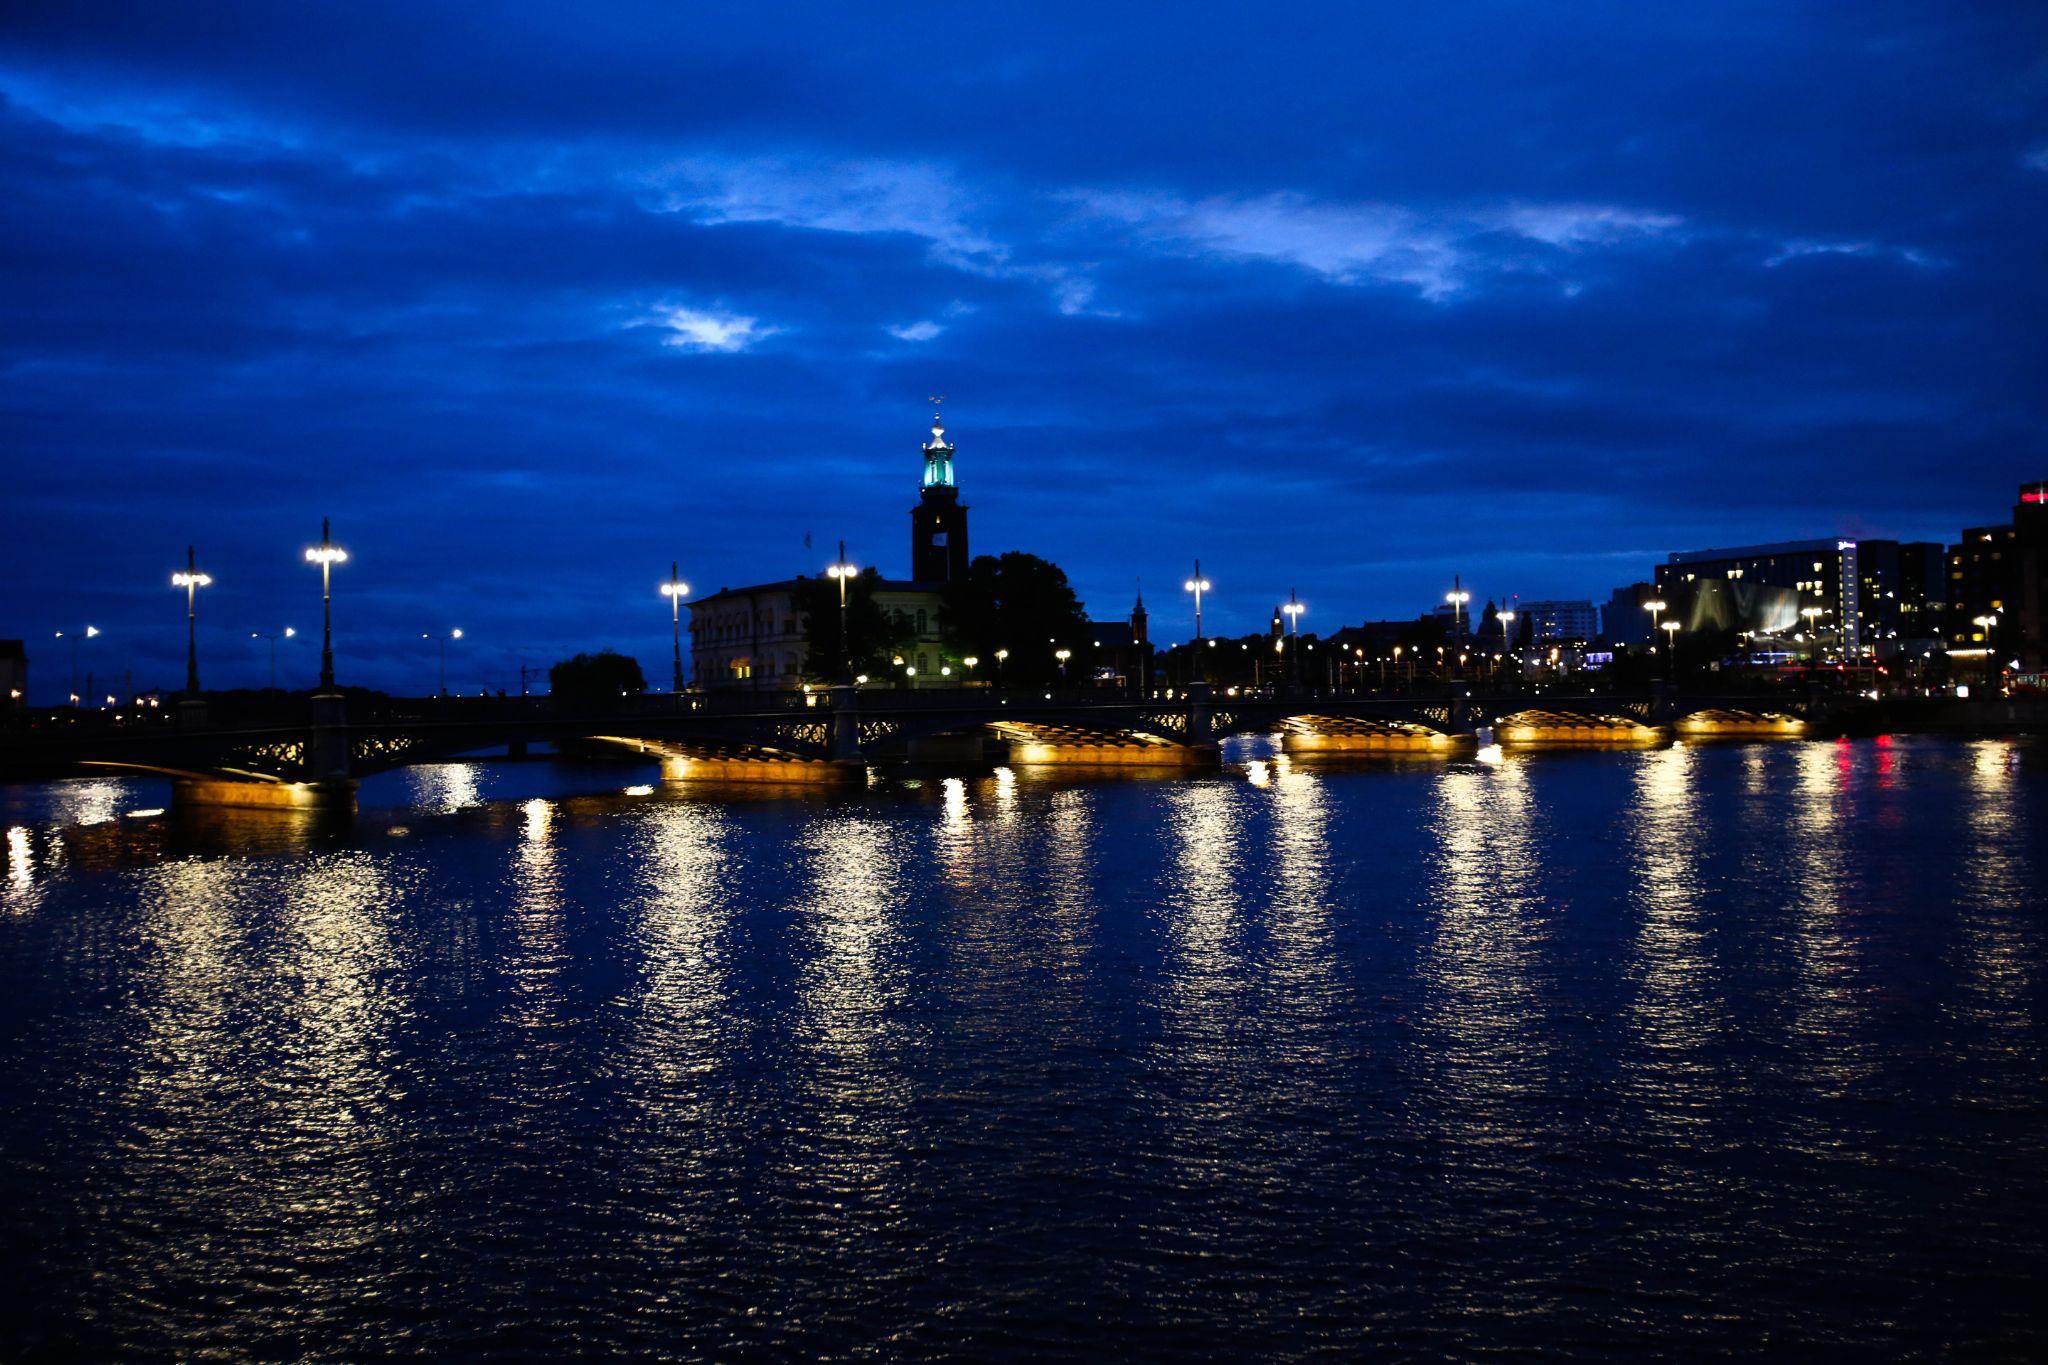 Stockholm by night. by Huwngvb